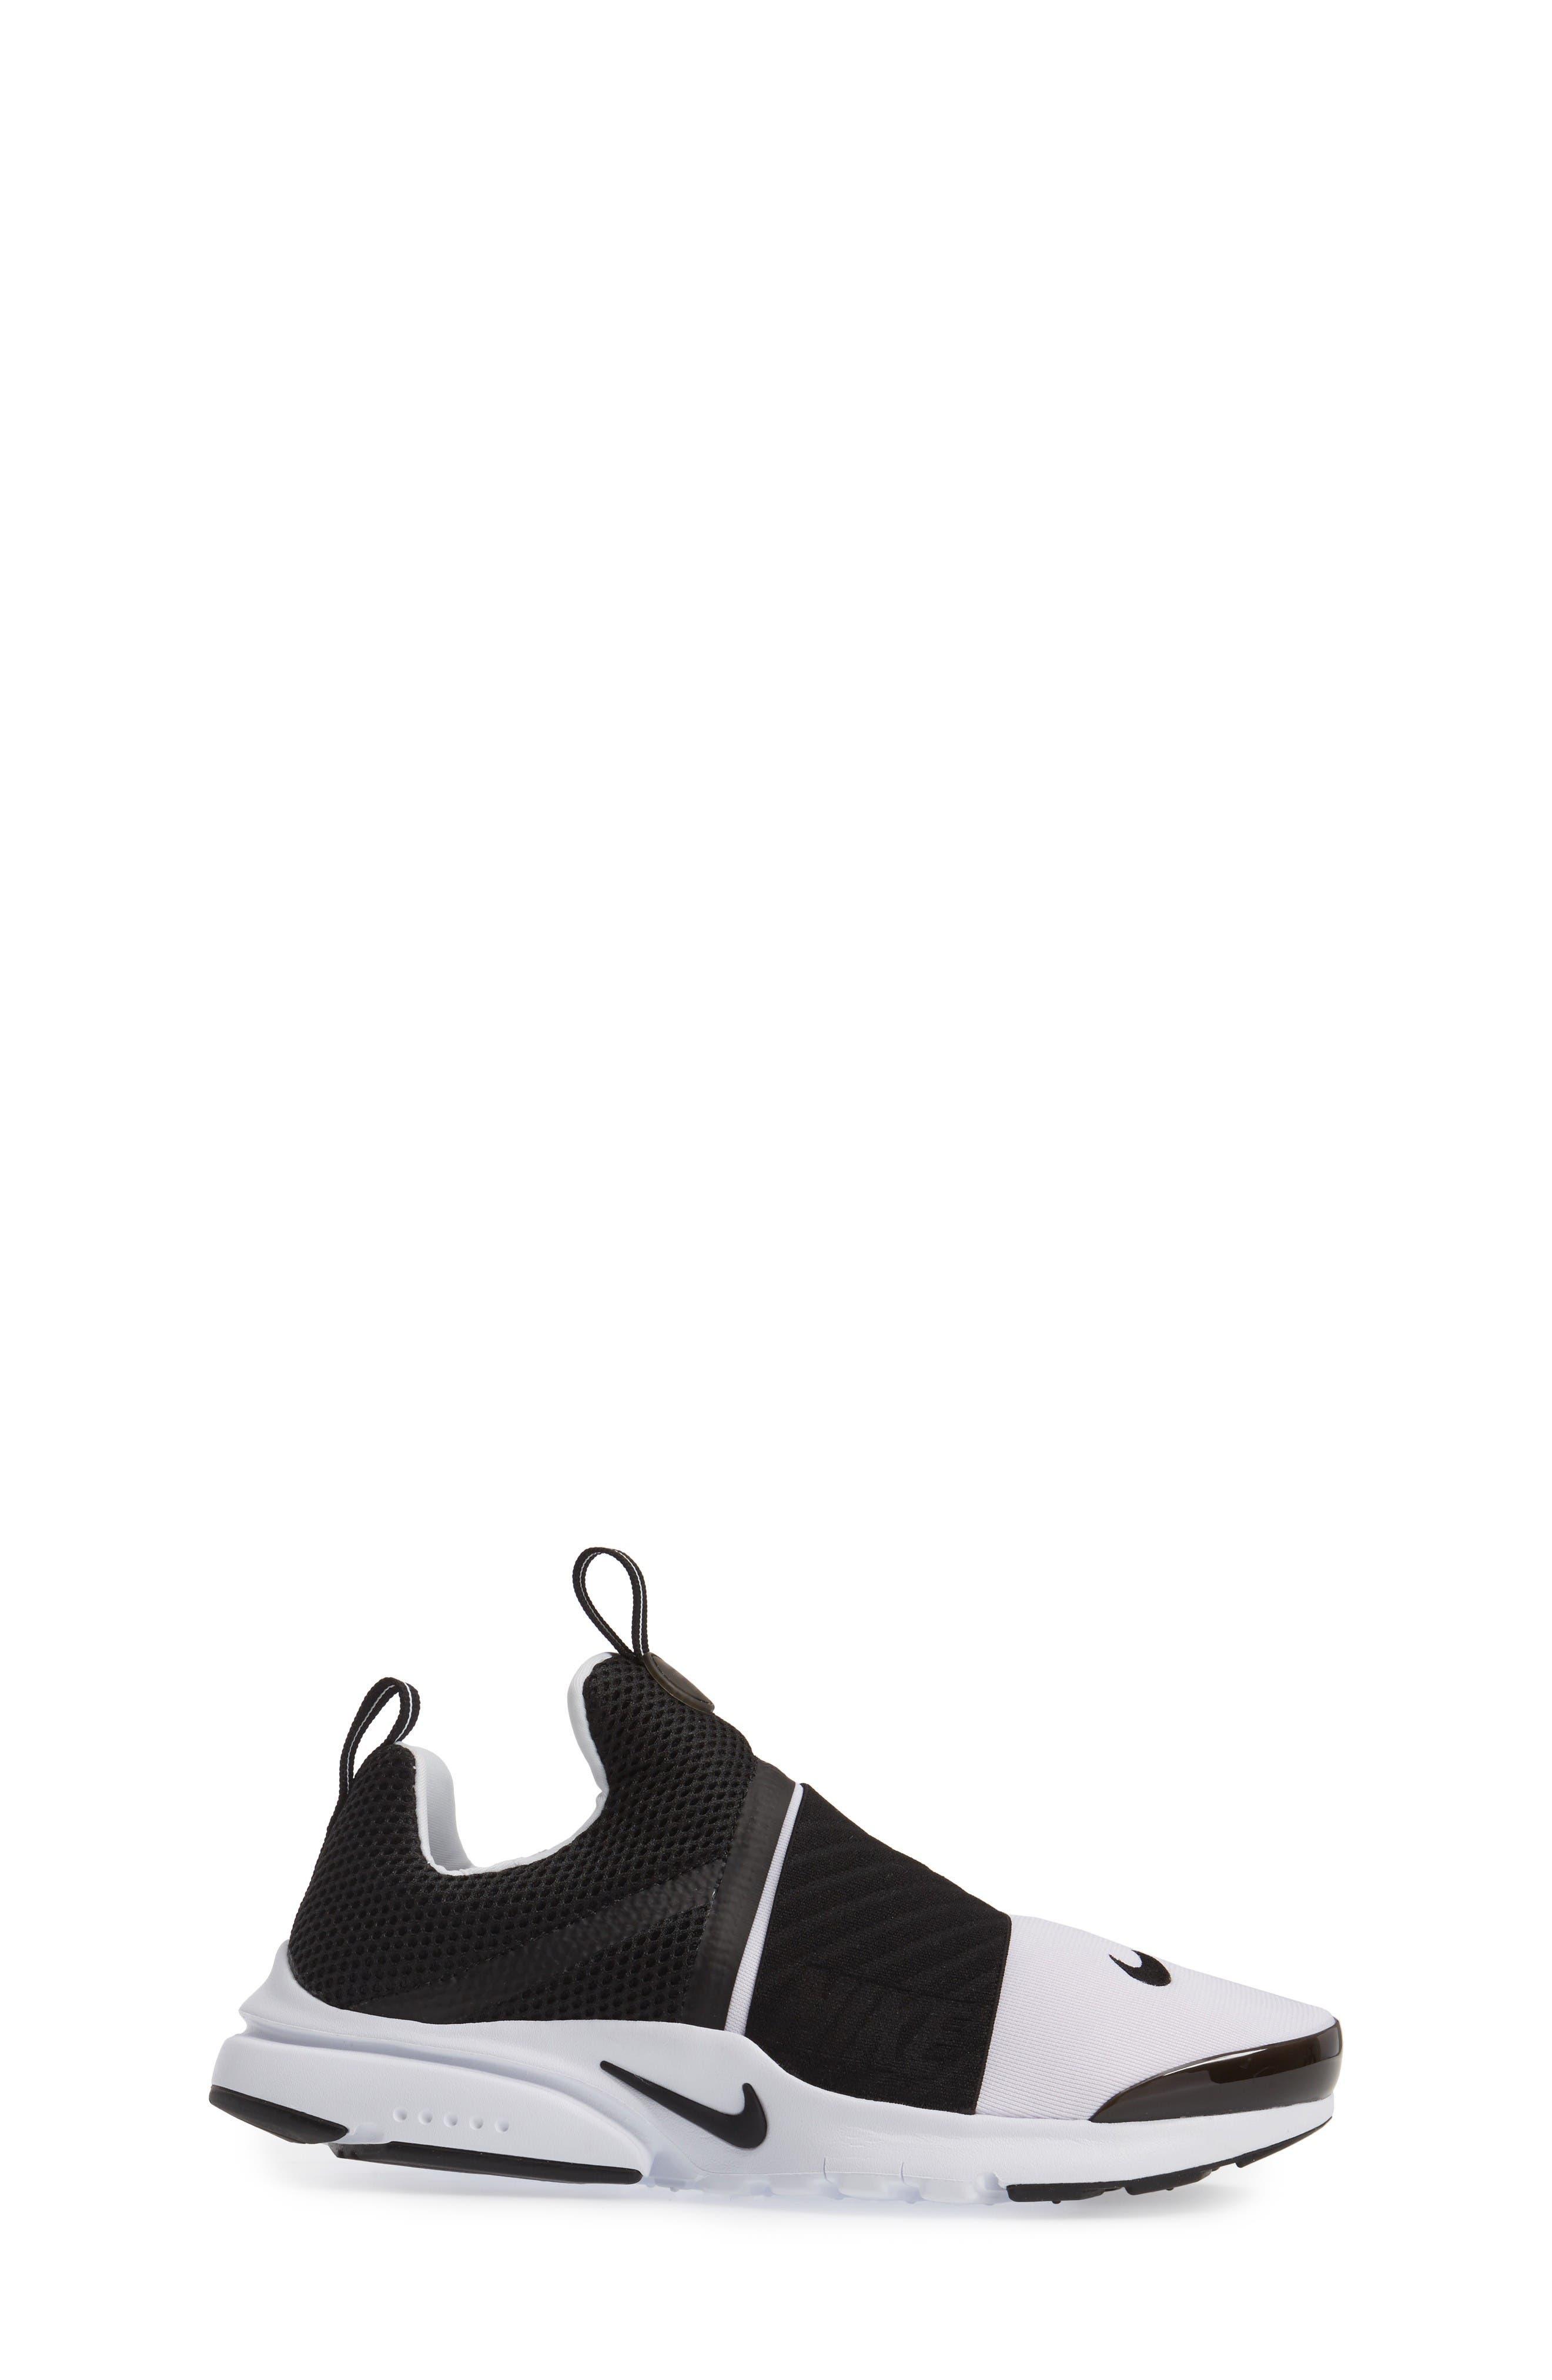 Alternate Image 3  - Nike Presto Extreme Sneaker (Walker, Toddler, Little Kid & Big Kid)